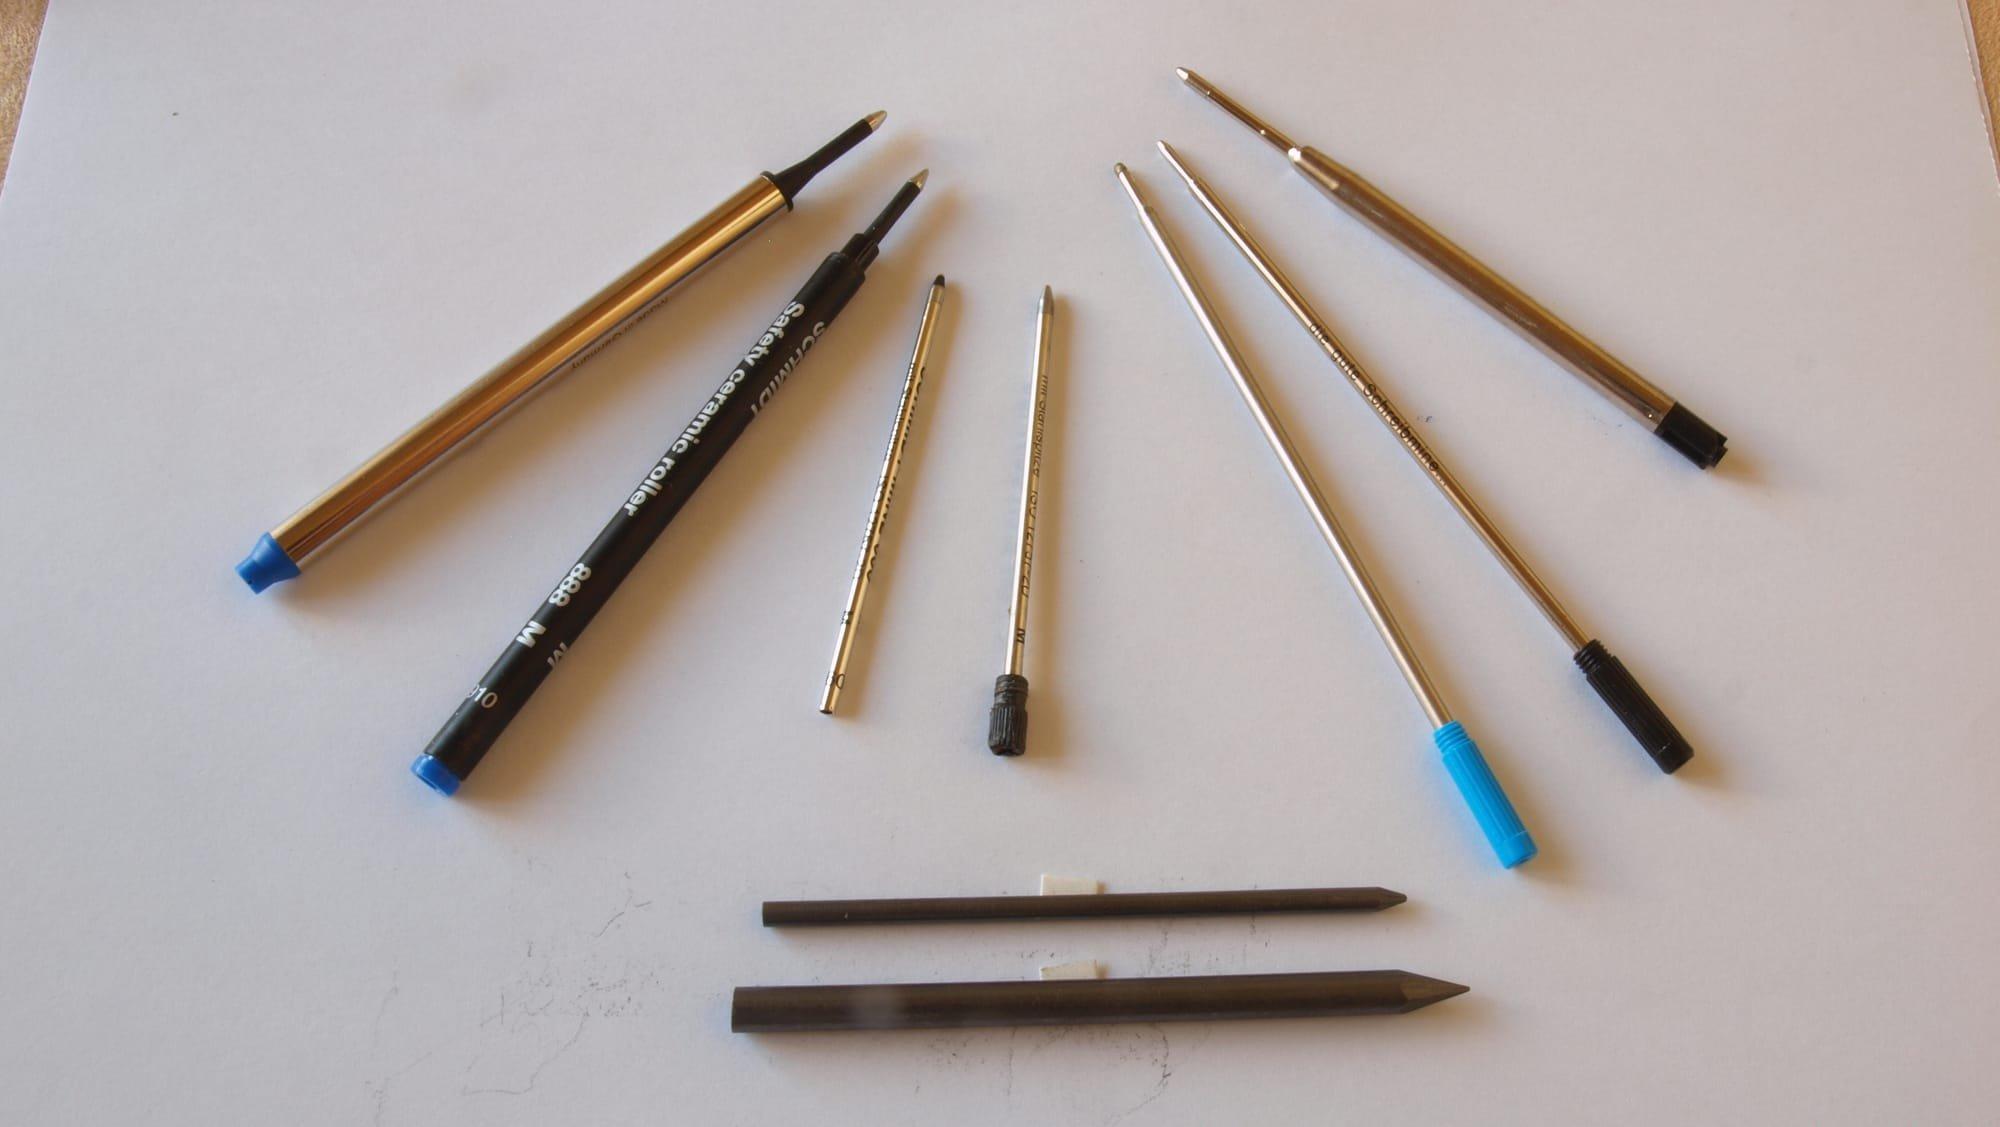 Diverse Kugelschreiber- und Bleistiftminen